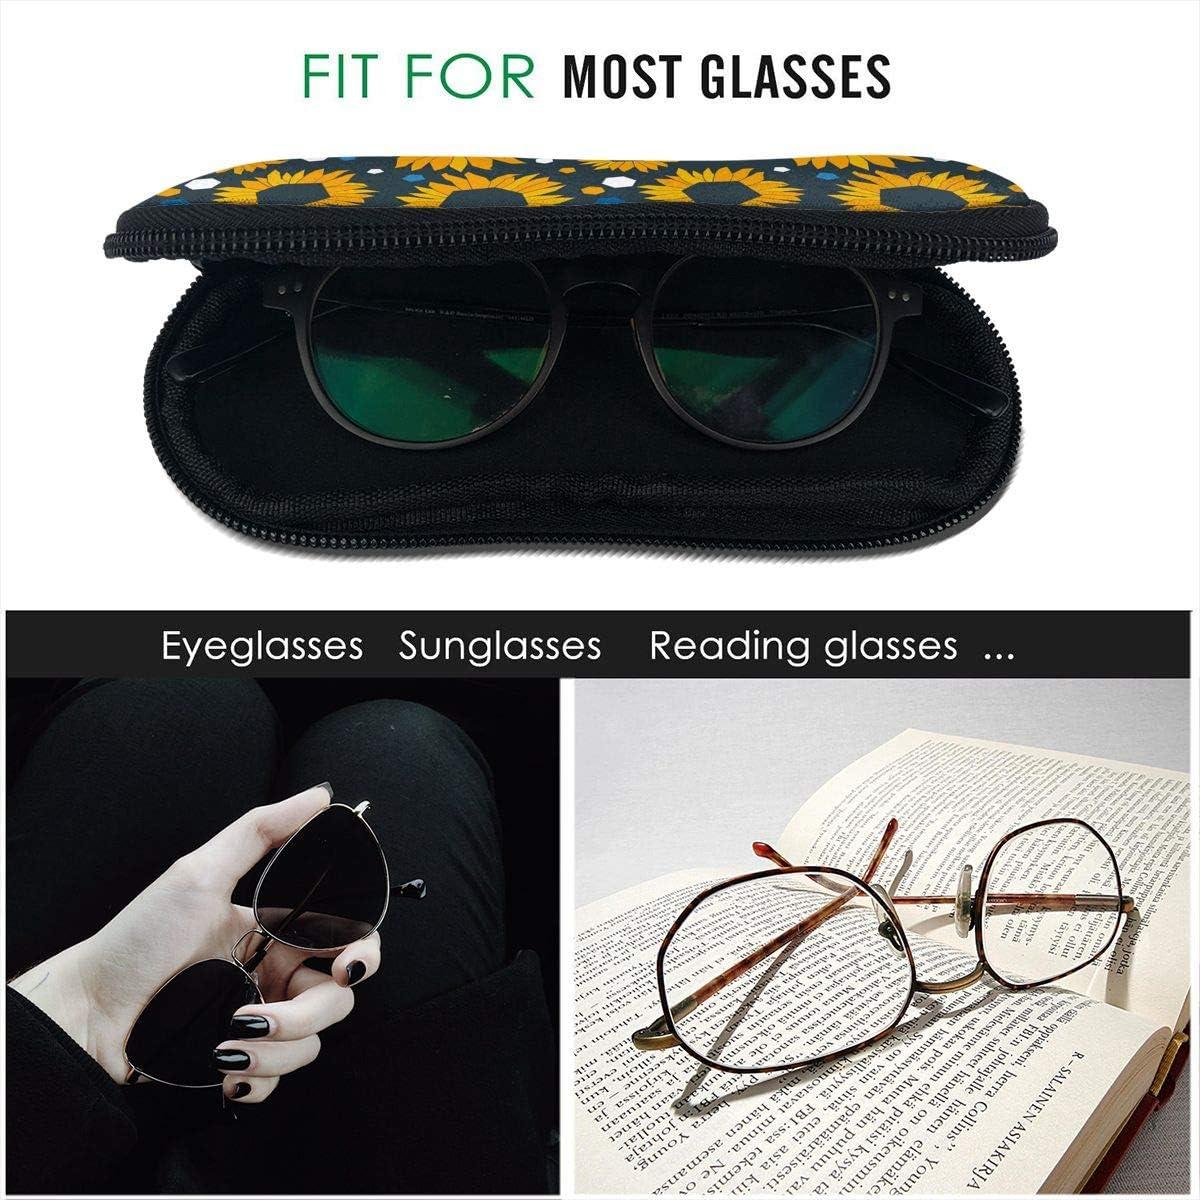 Sunflowers Painting Sunglasses Soft Case Ultra Light Neoprene Zipper Eyeglass Case With Key Chain